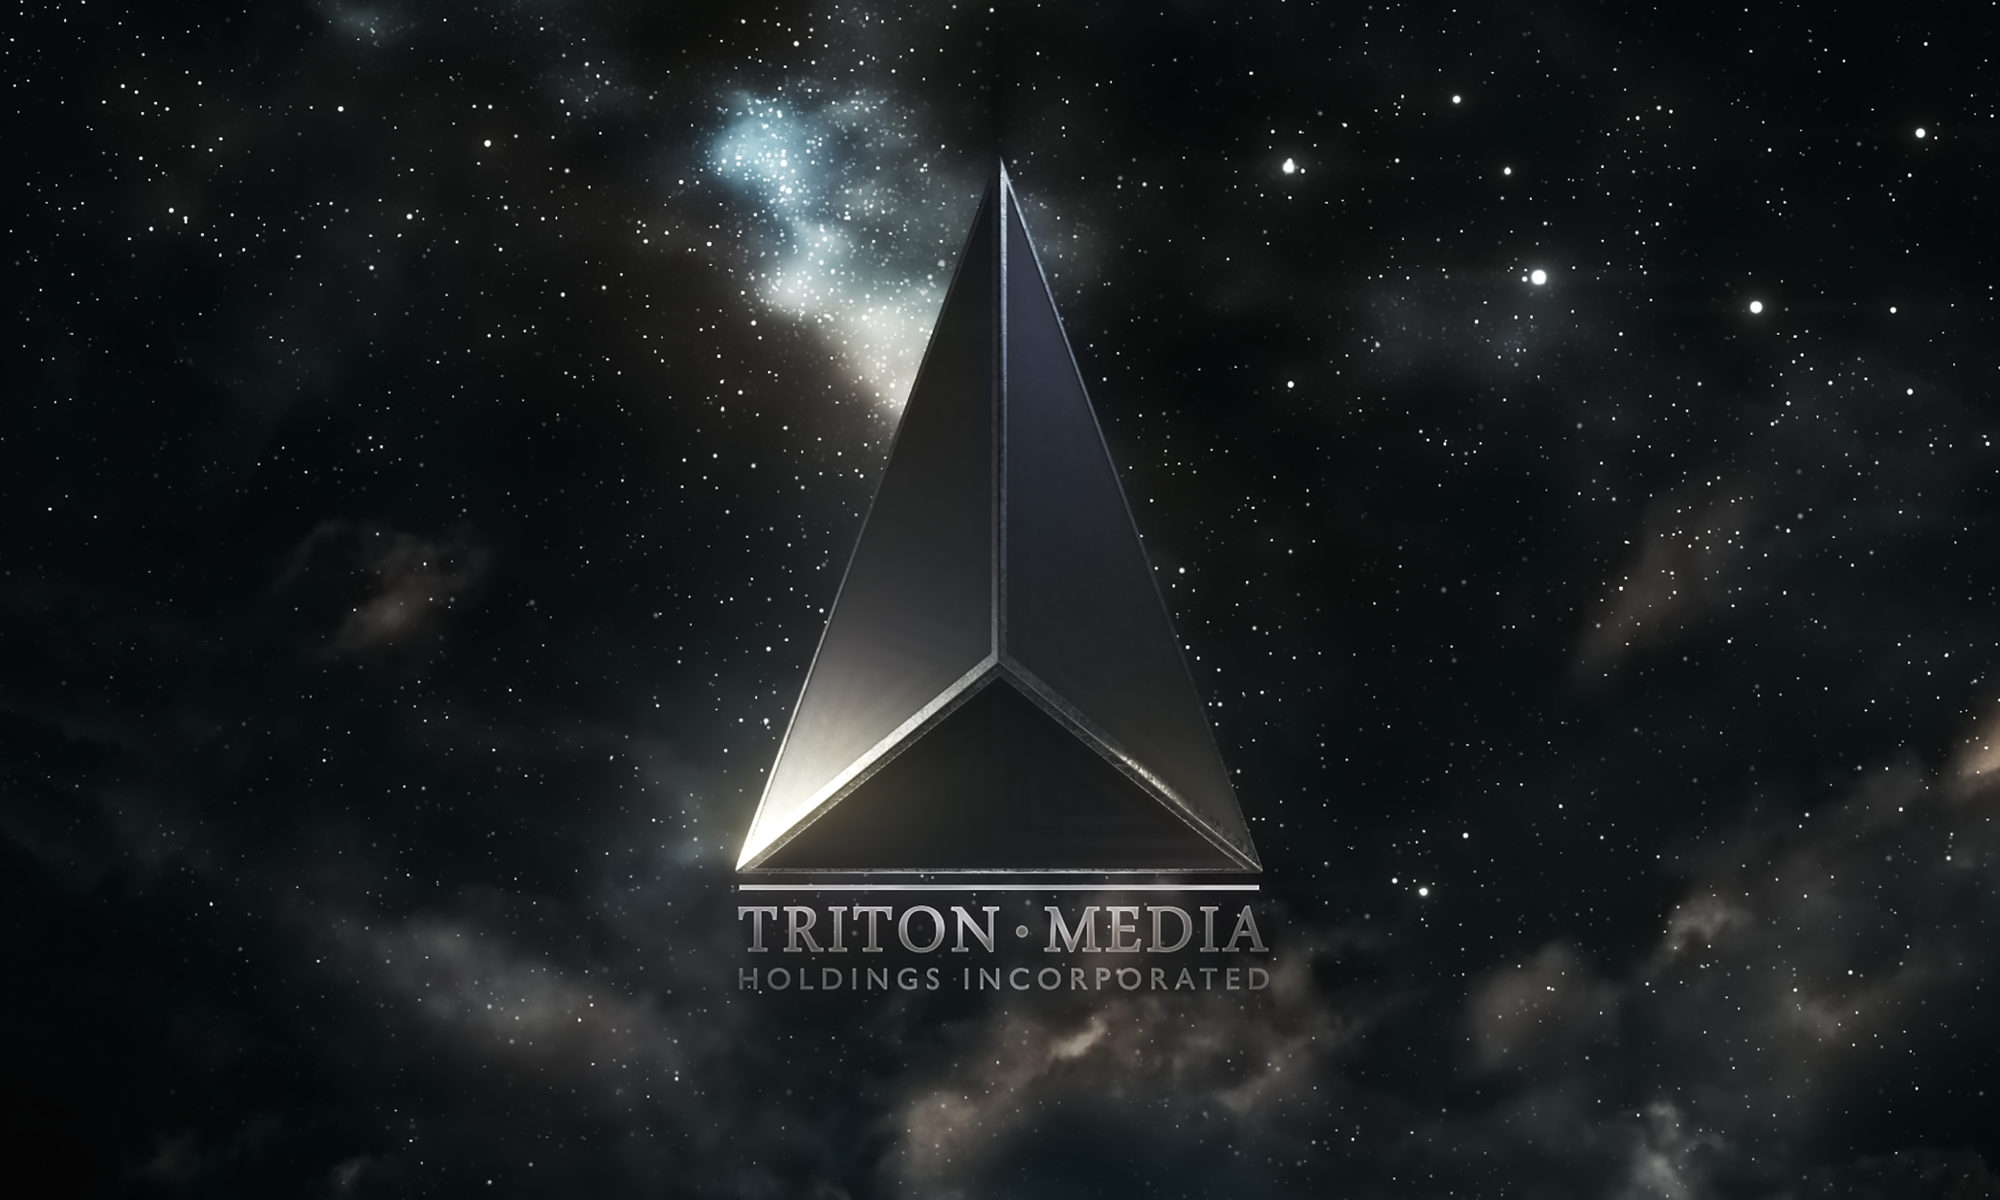 Triton Media Holdings Incorporated